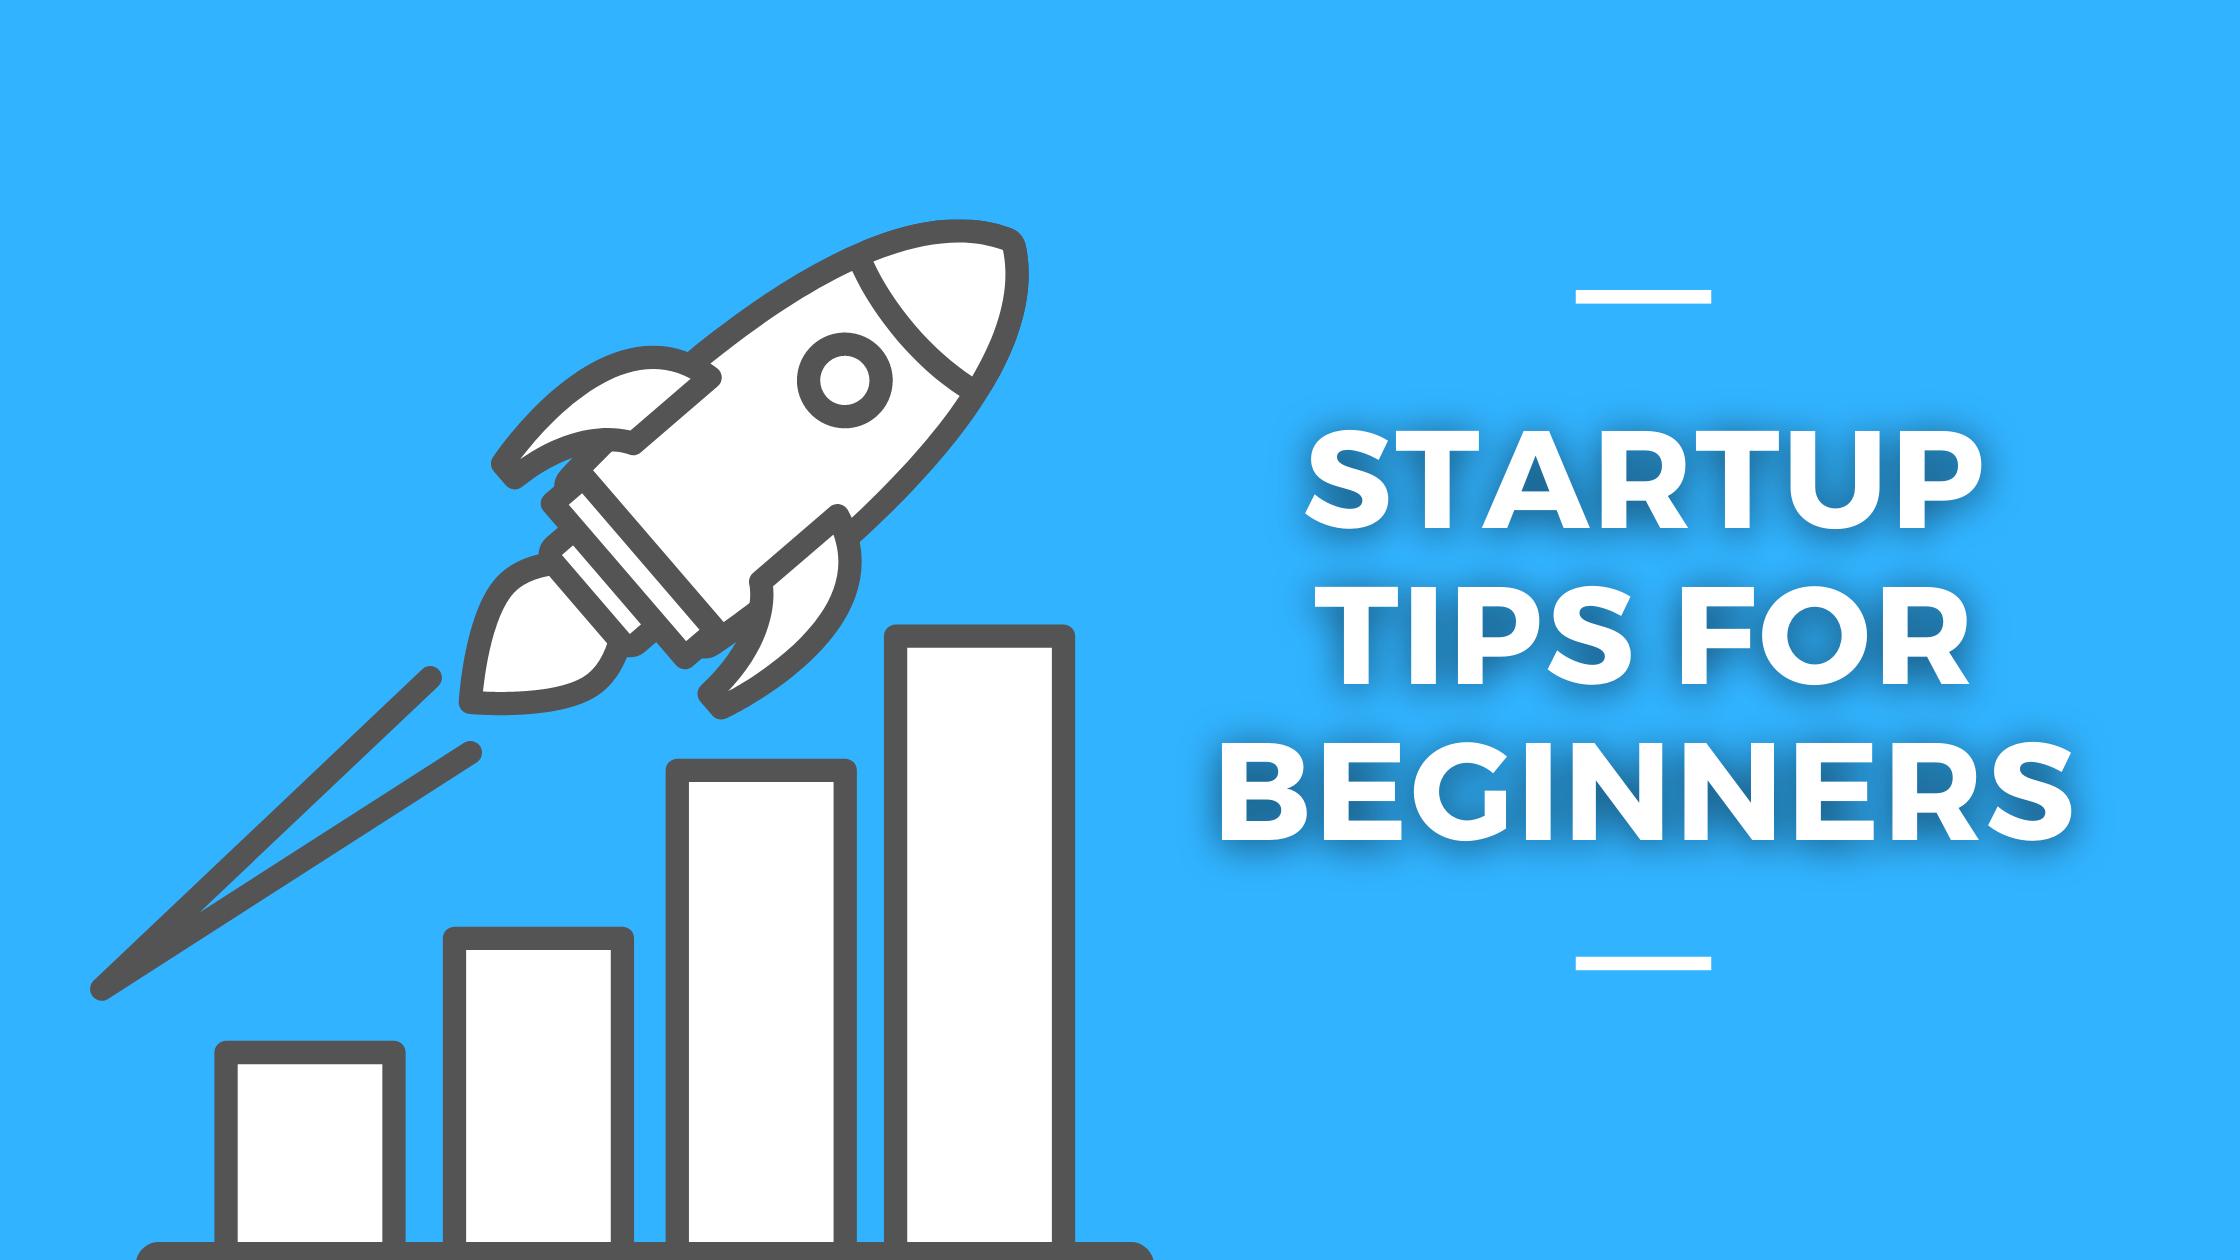 Startup Tips for Beginners